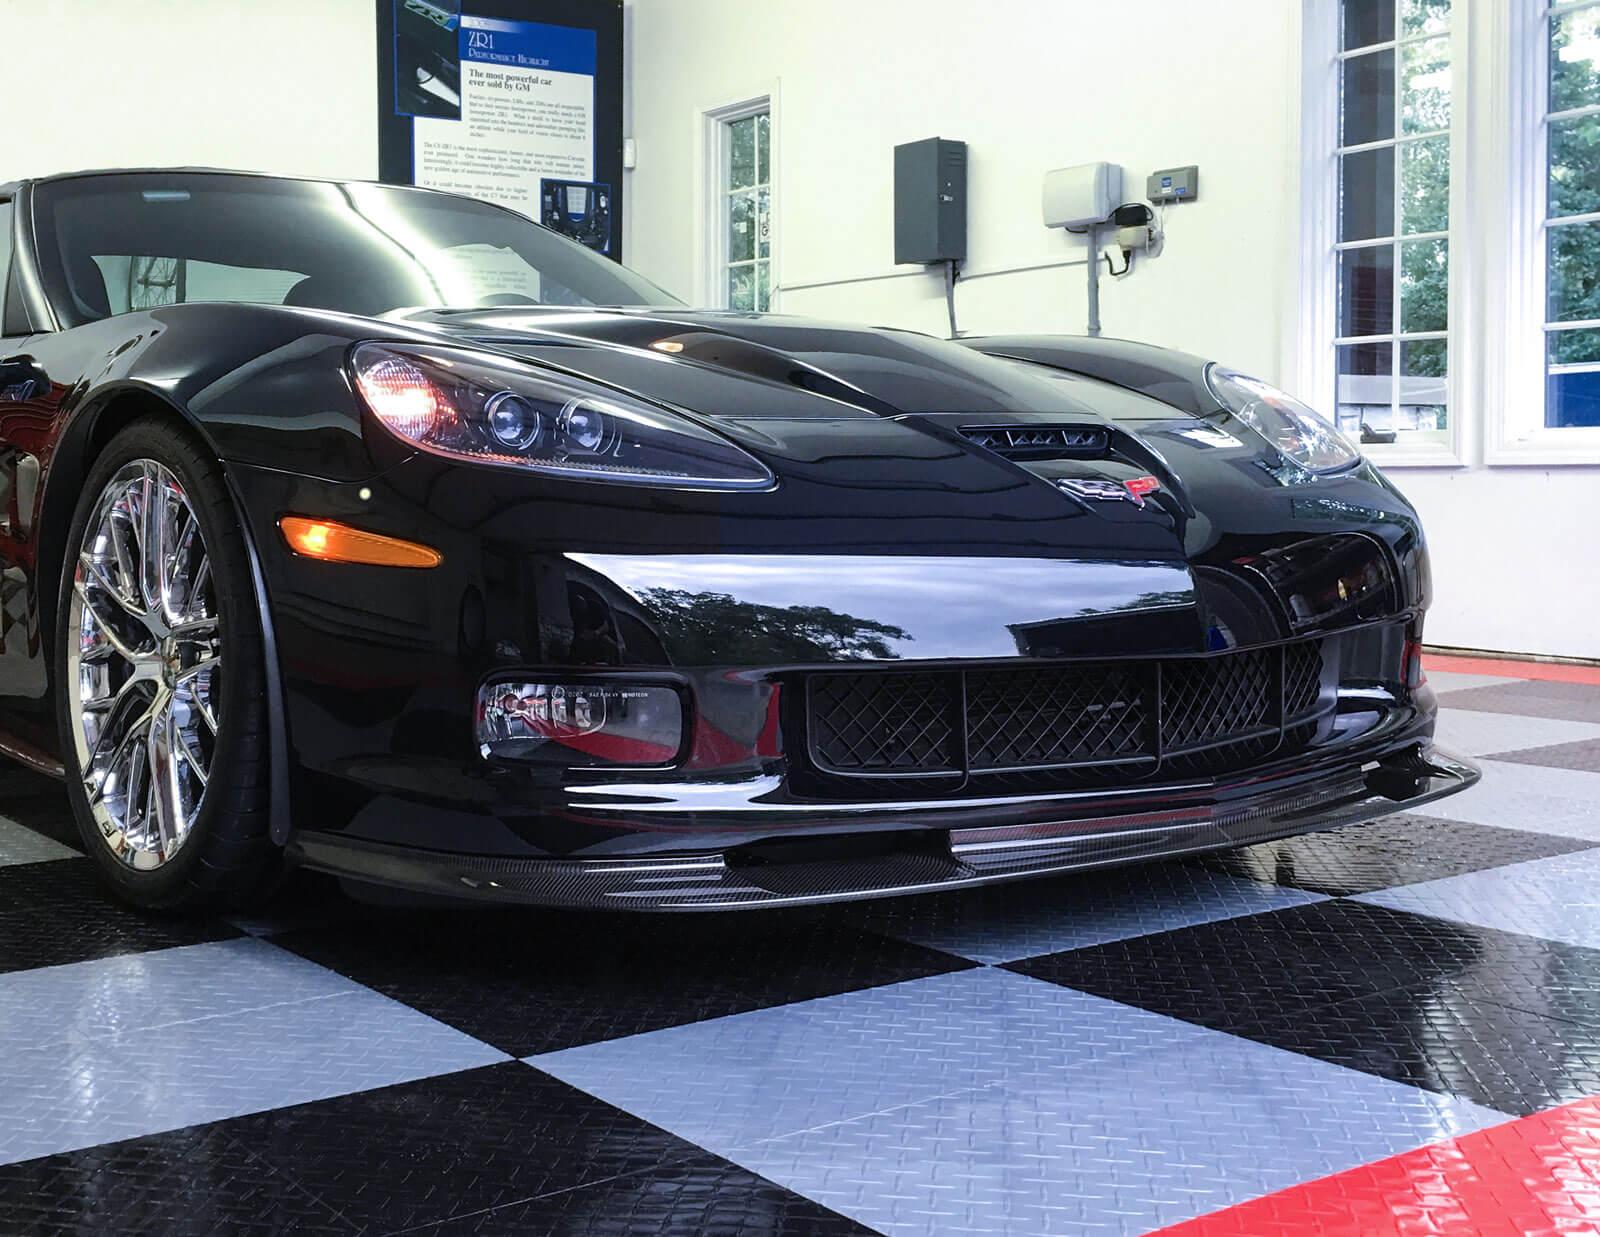 RaceDeck Diamond Tuffshield black, gray, and red showcases a black Corvette.